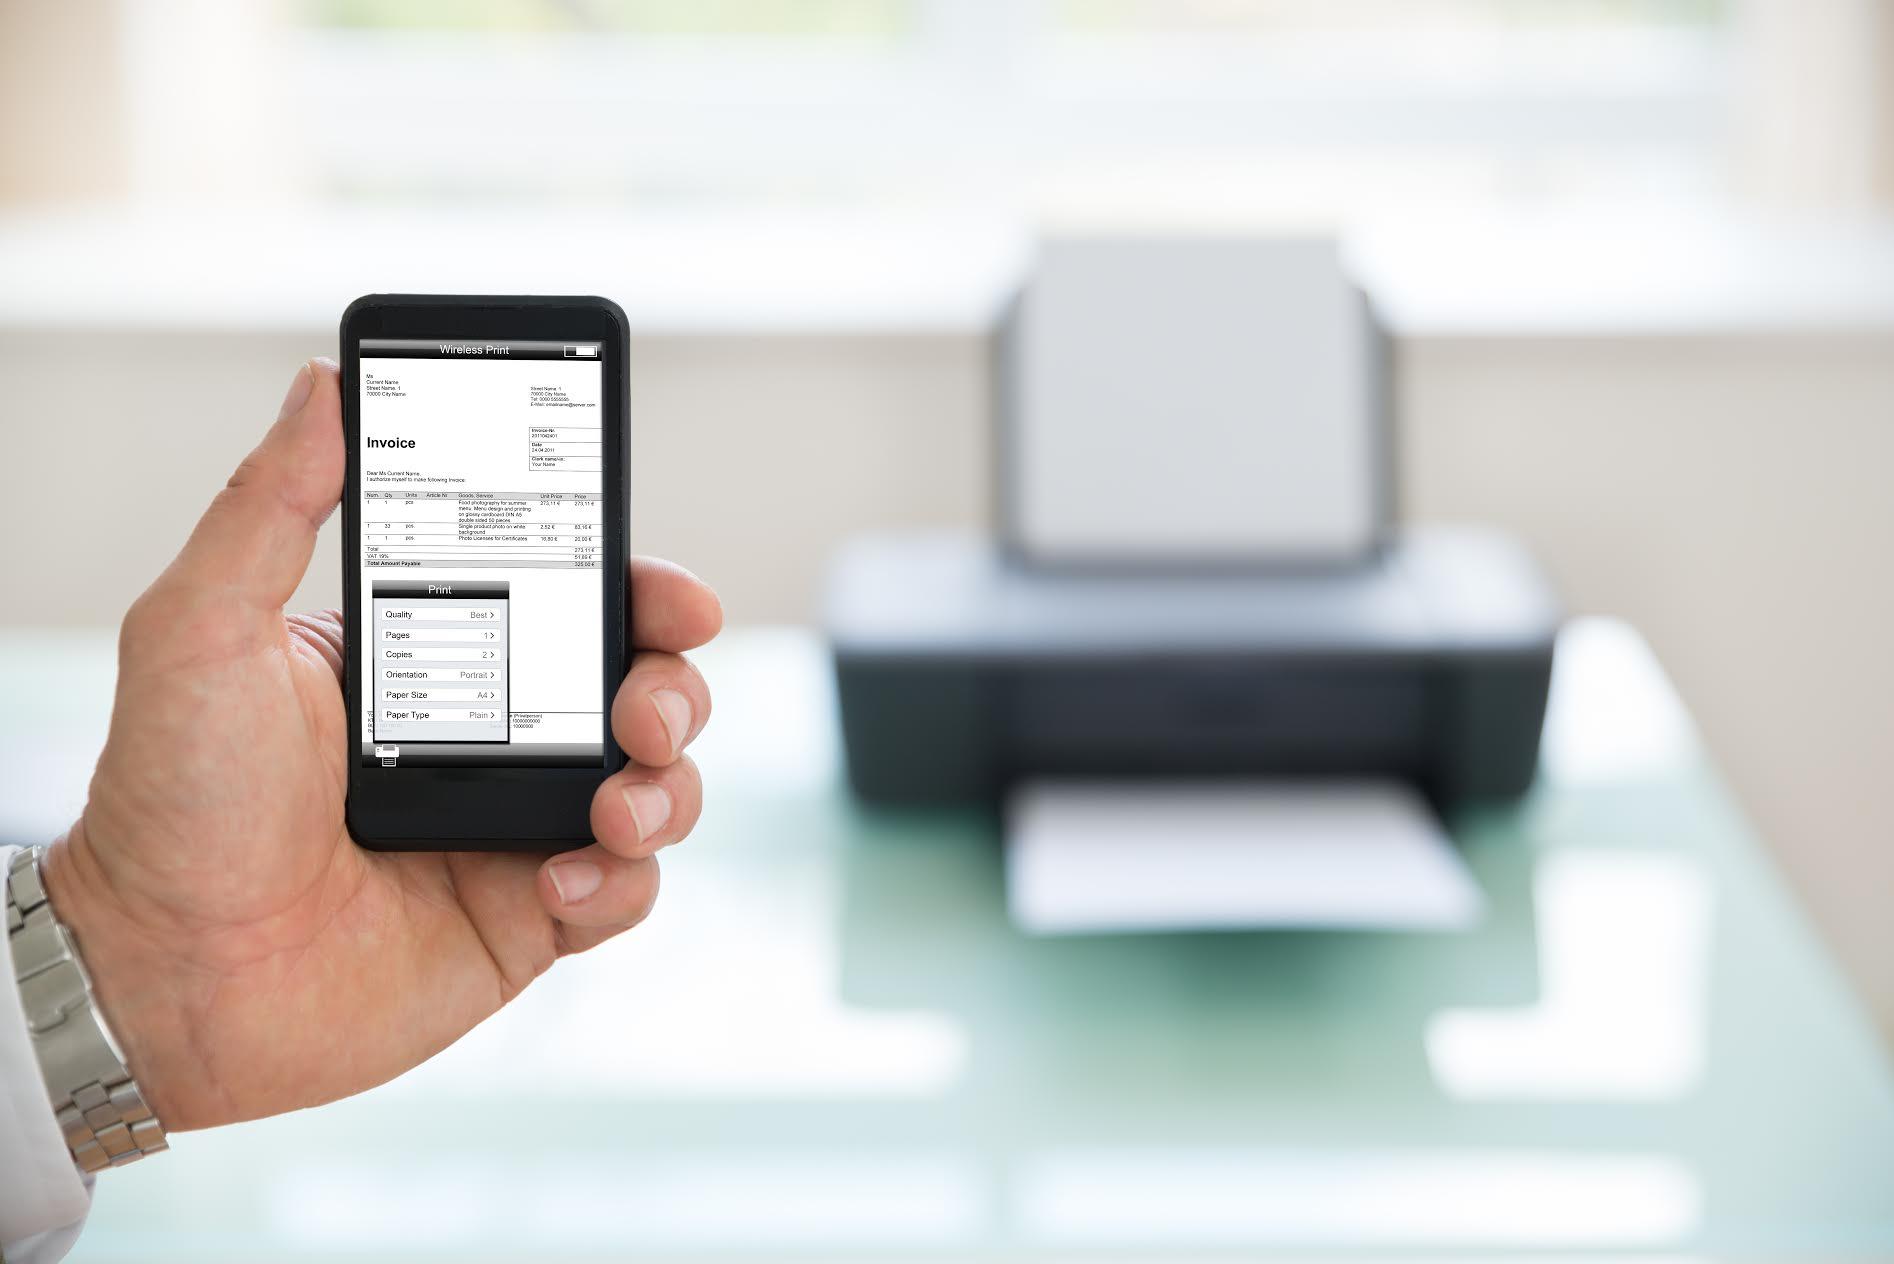 Aplicación gratuita permitirá que más negocios en Costa Rica usen facturación electrónica